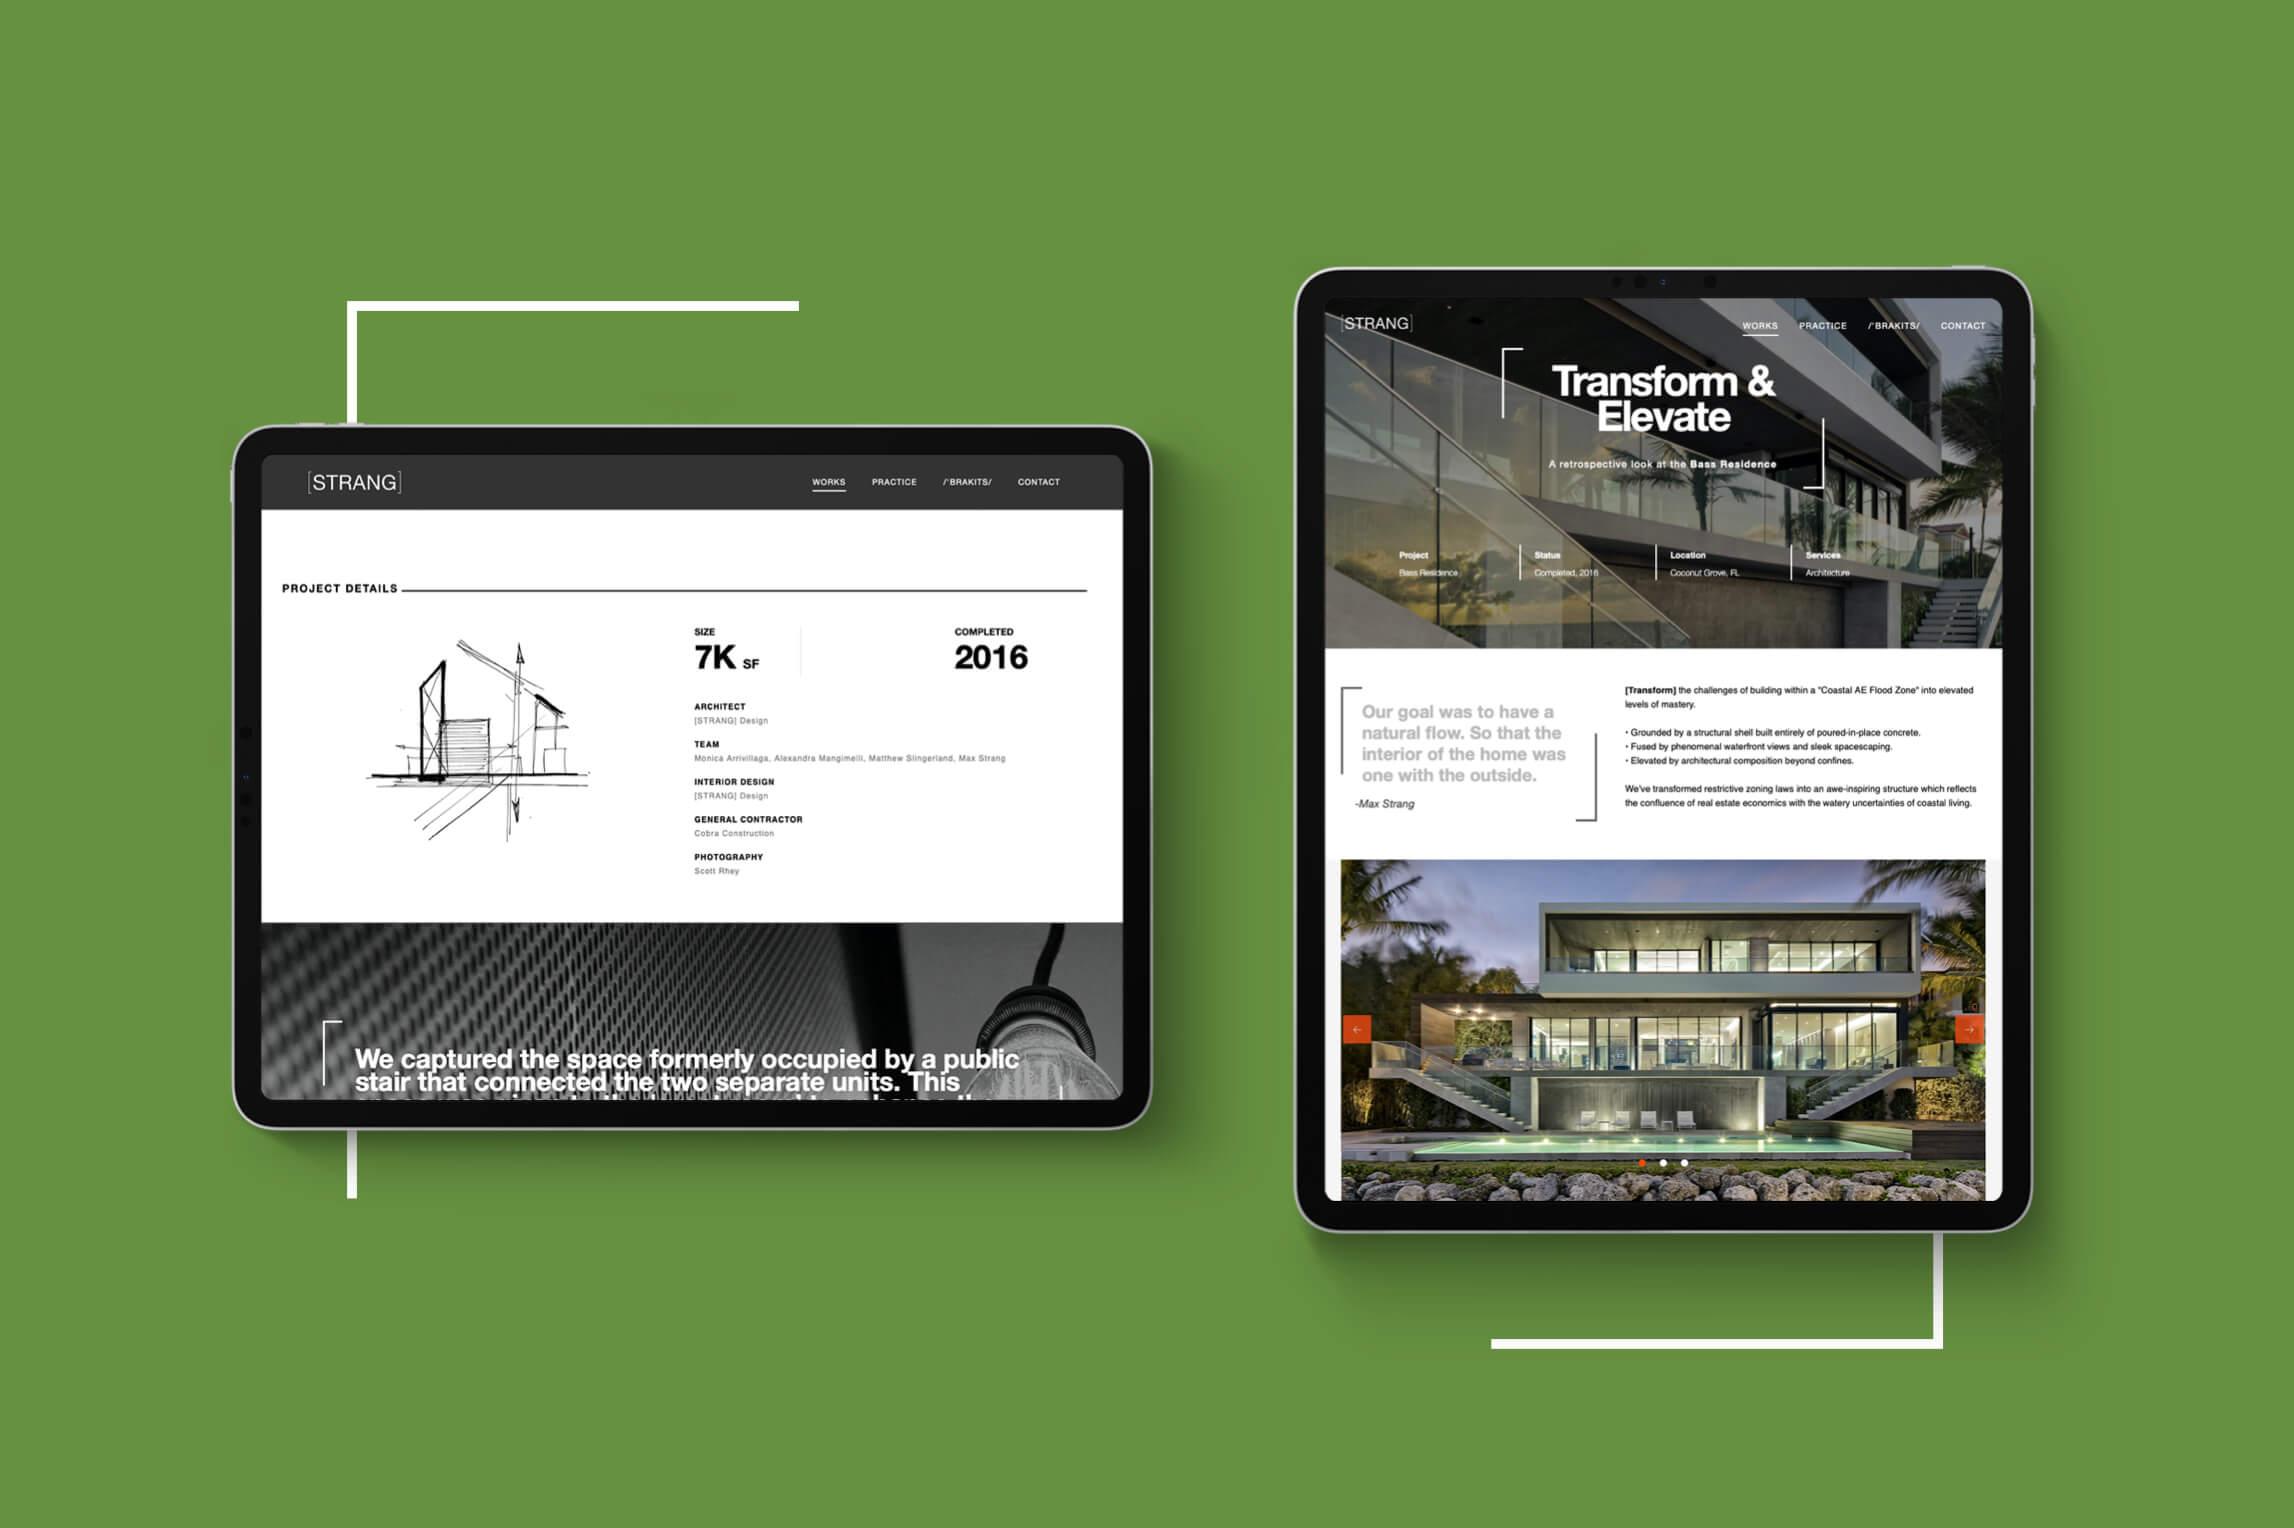 Strang Tablet Transform & Elevate Web Page